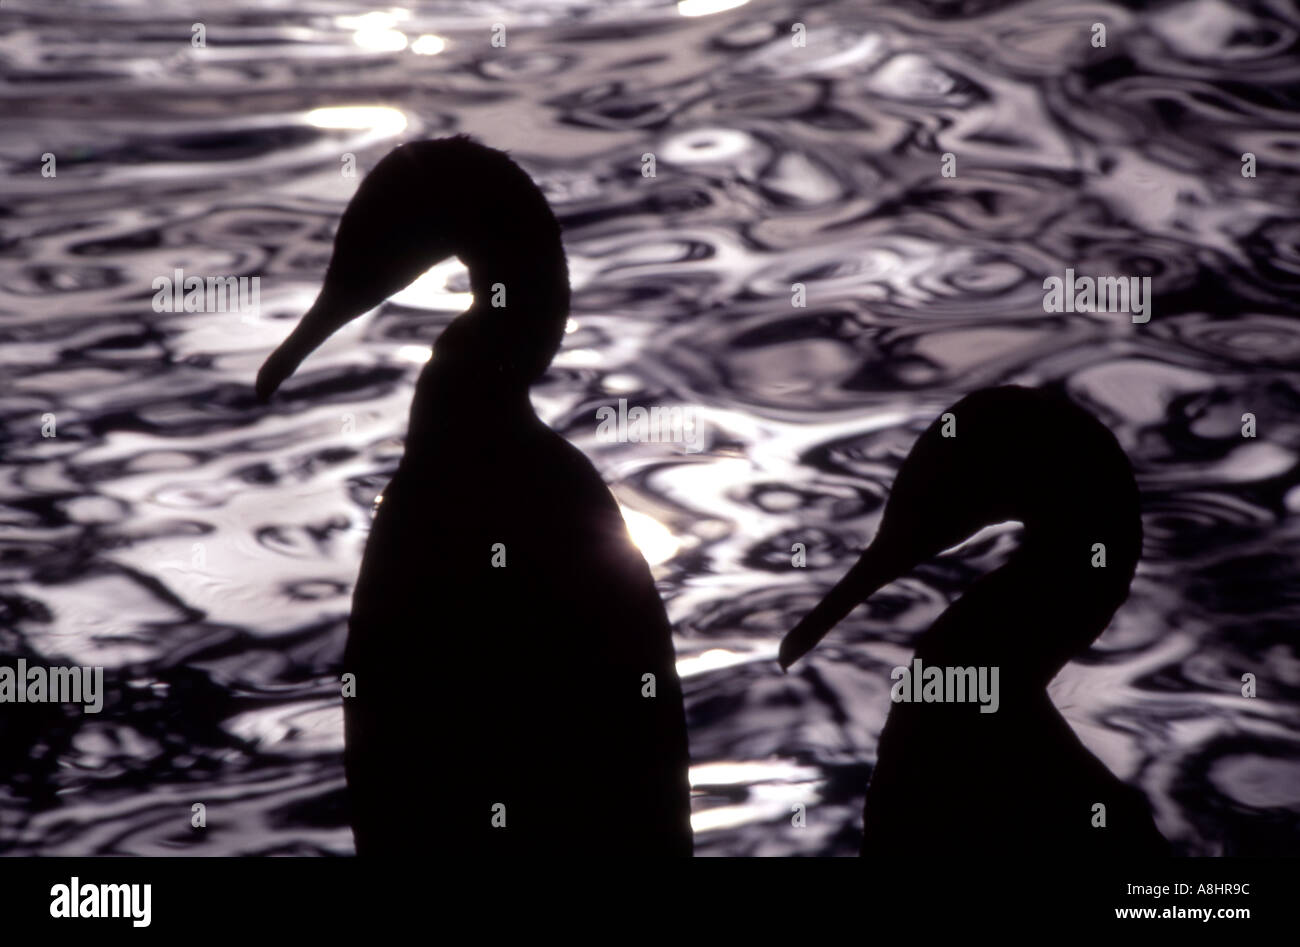 Socotra cormorant Phalacrocorax nigrogularis in silhouette Saudi Arabia - Stock Image